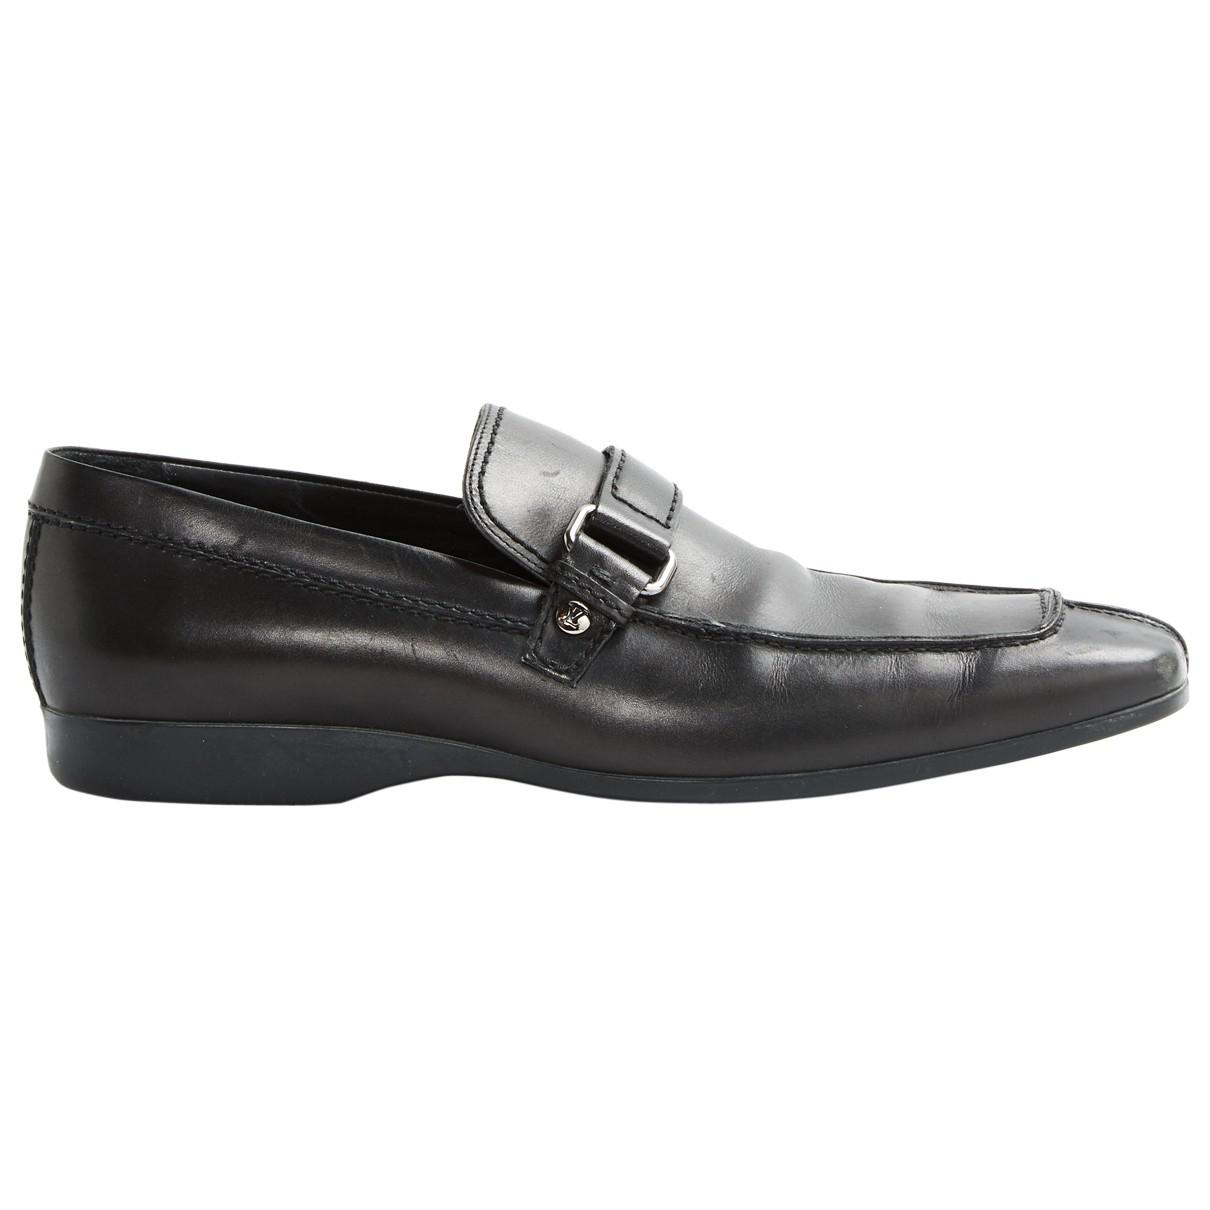 1cabcfe1521d Louis Vuitton. Women s Black Leather Flats.  295  272 From Vestiaire  Collective ...